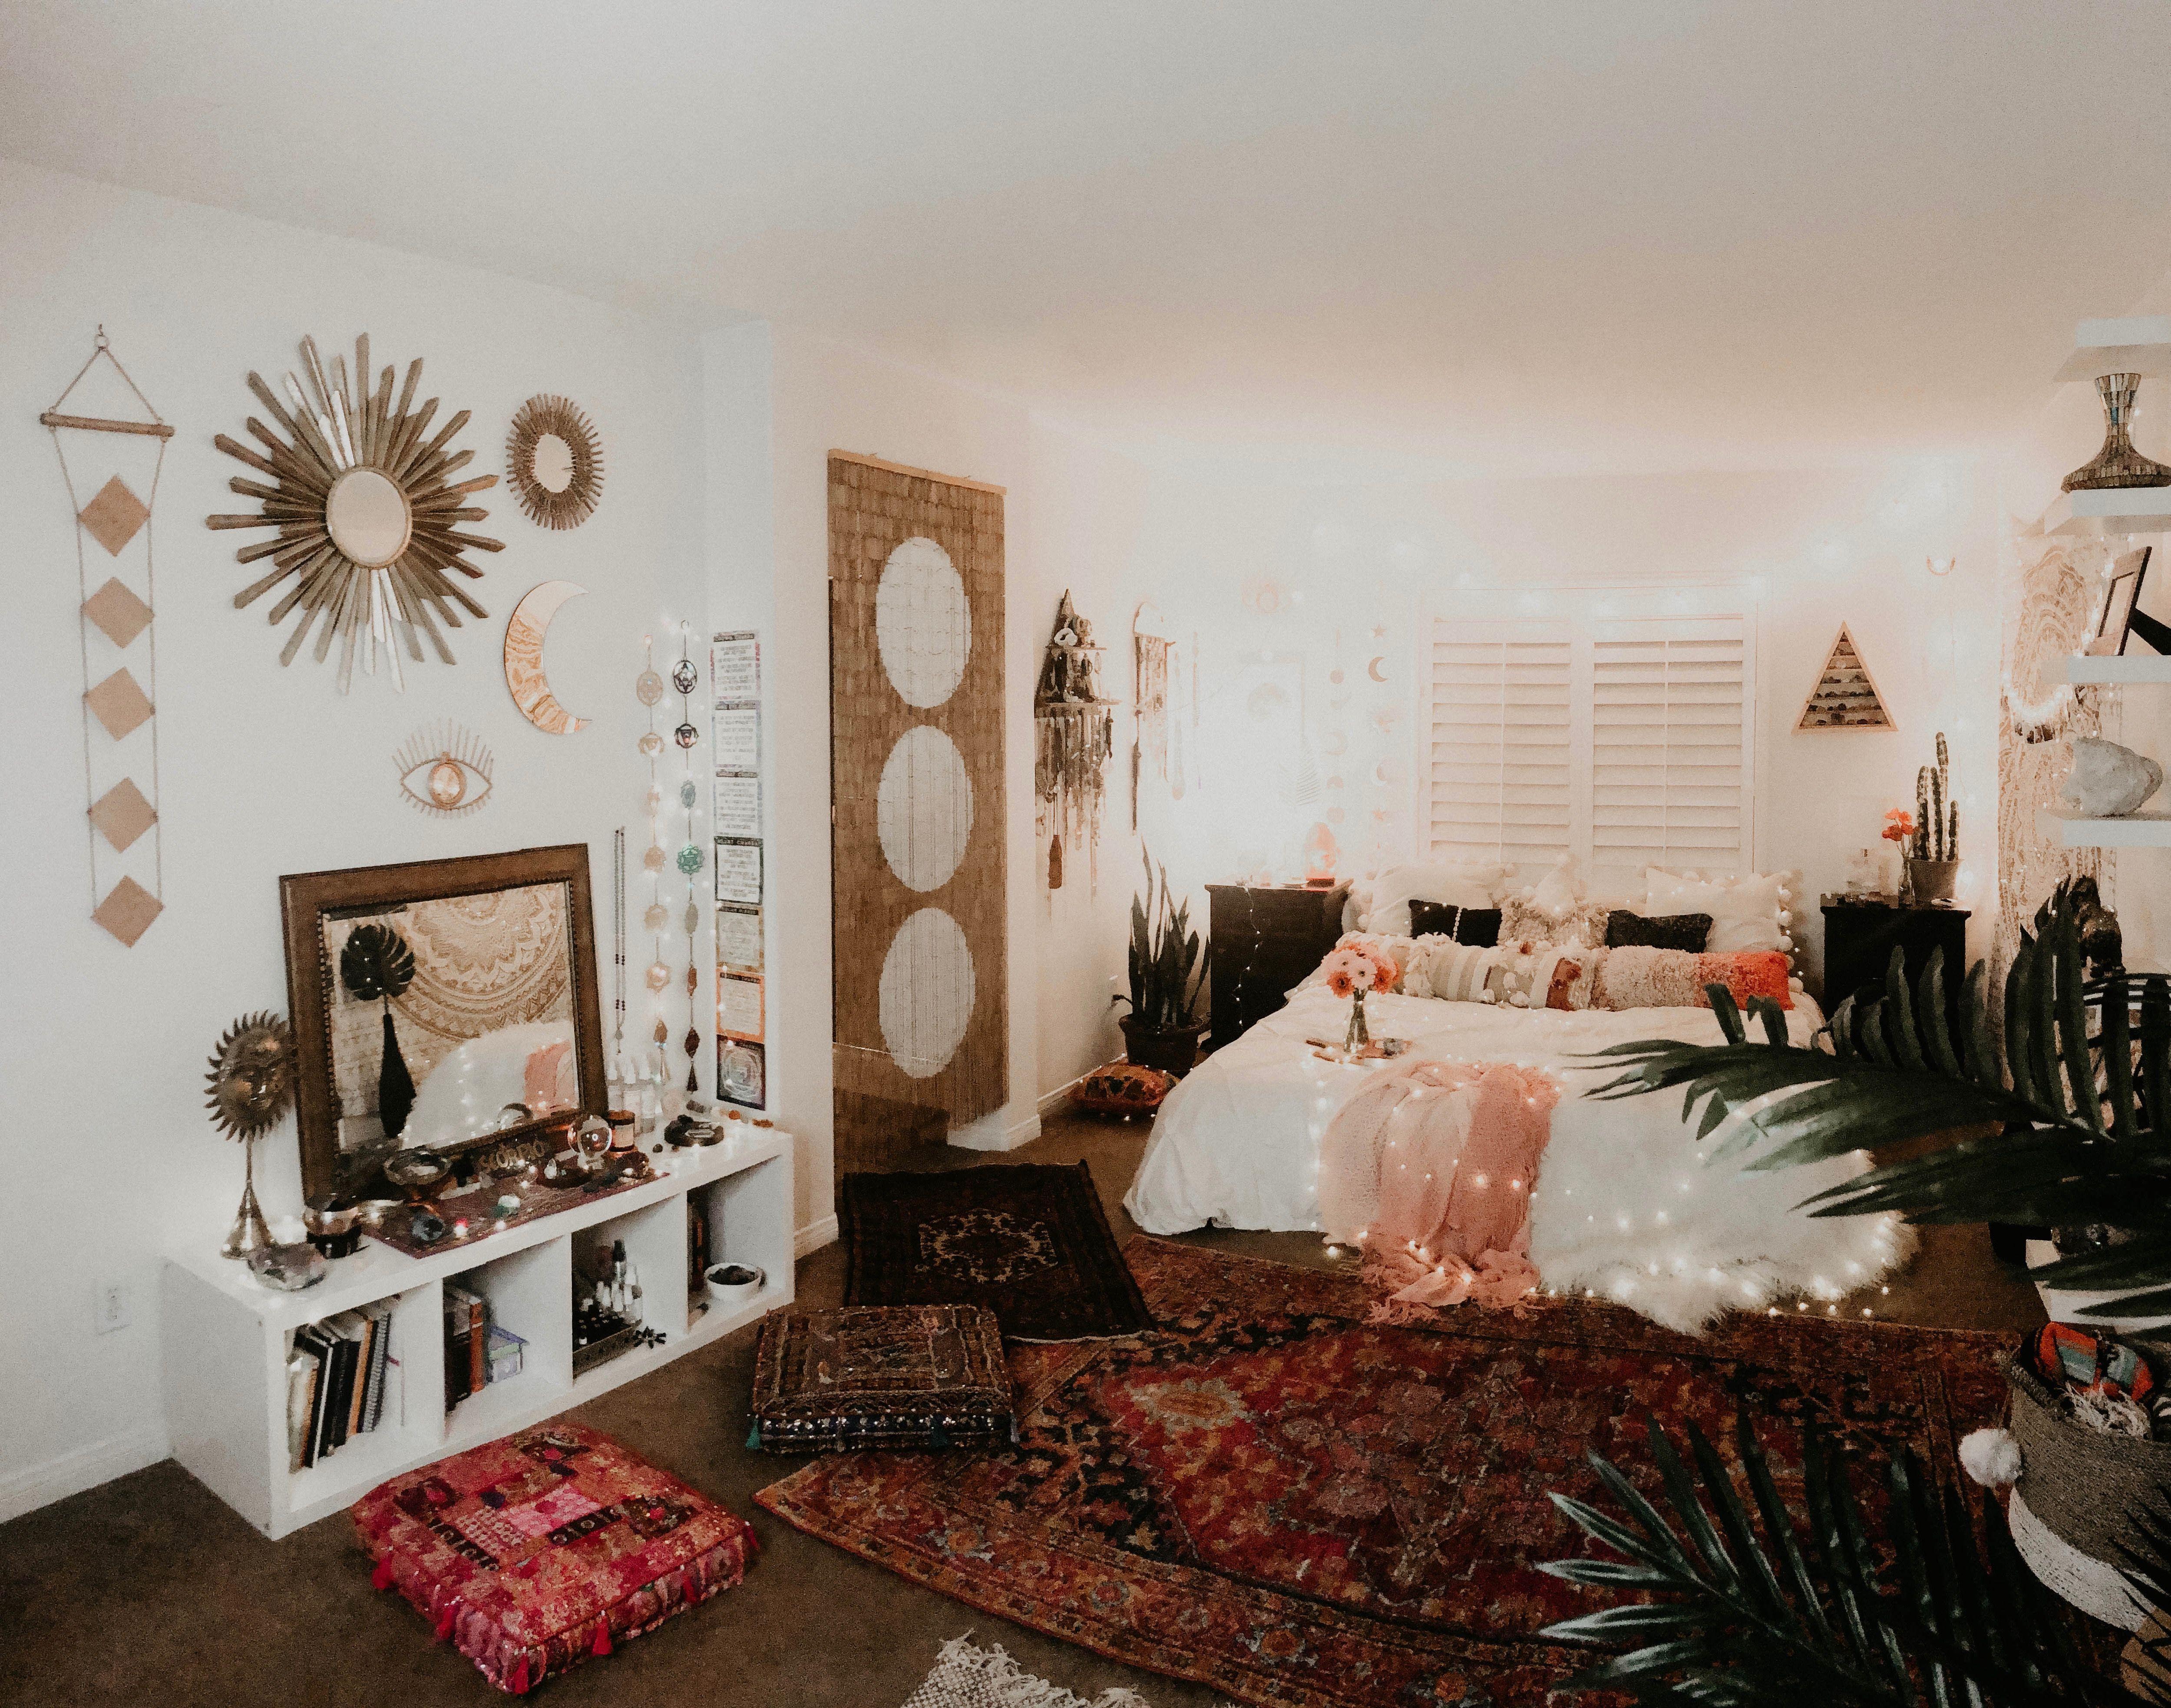 Ladyscorpio101 Ladyscorpio101 Com Save 10 Off Your Next Lady Scorpio Order With Code Iheartpinterest Star Bedroom Home Bedroom Aesthetic Bedroom